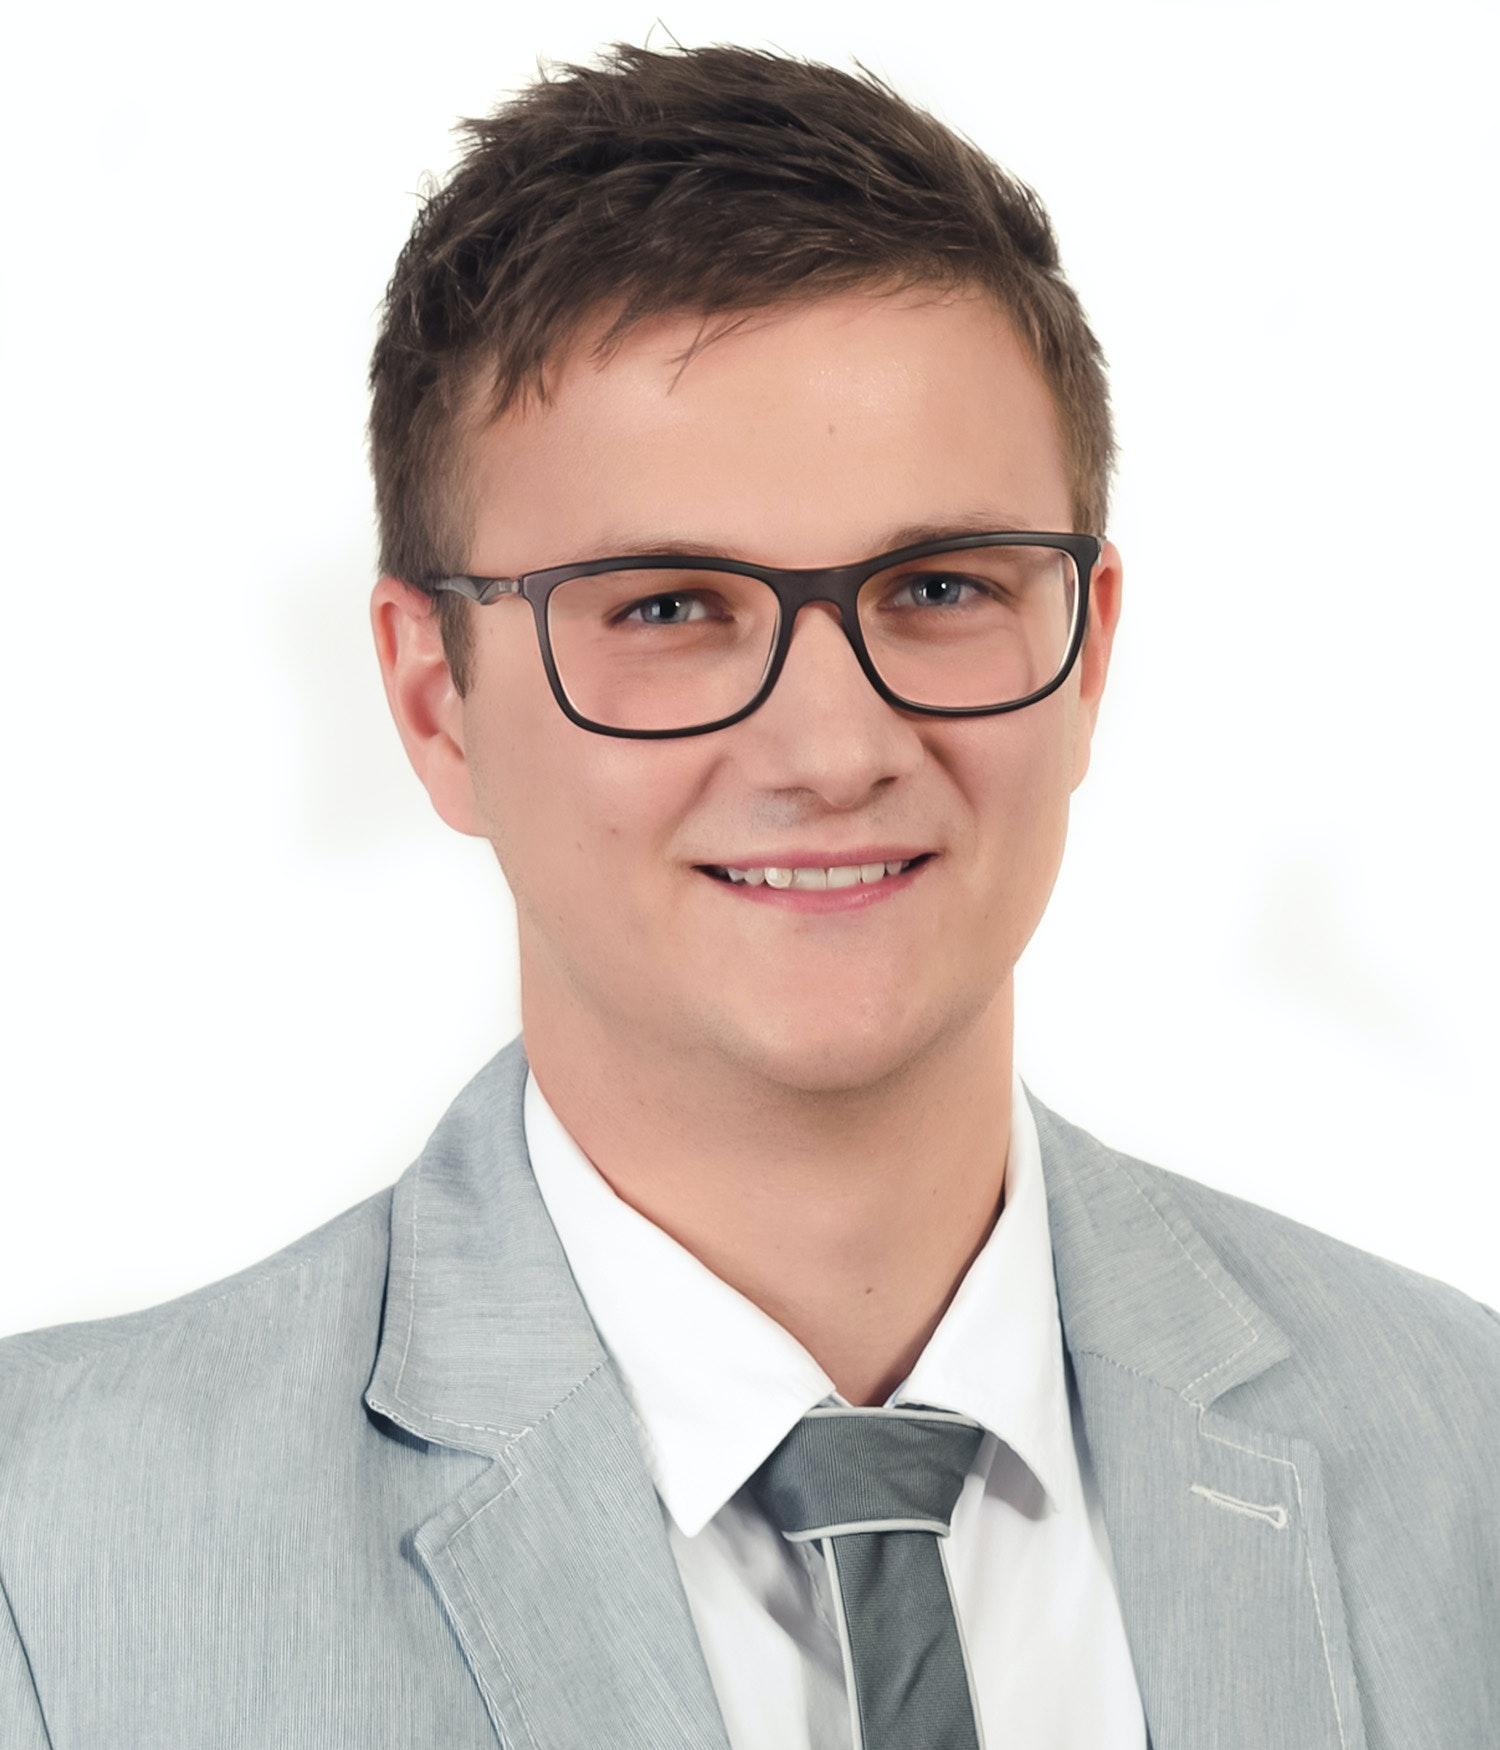 Patrick Fritzsche